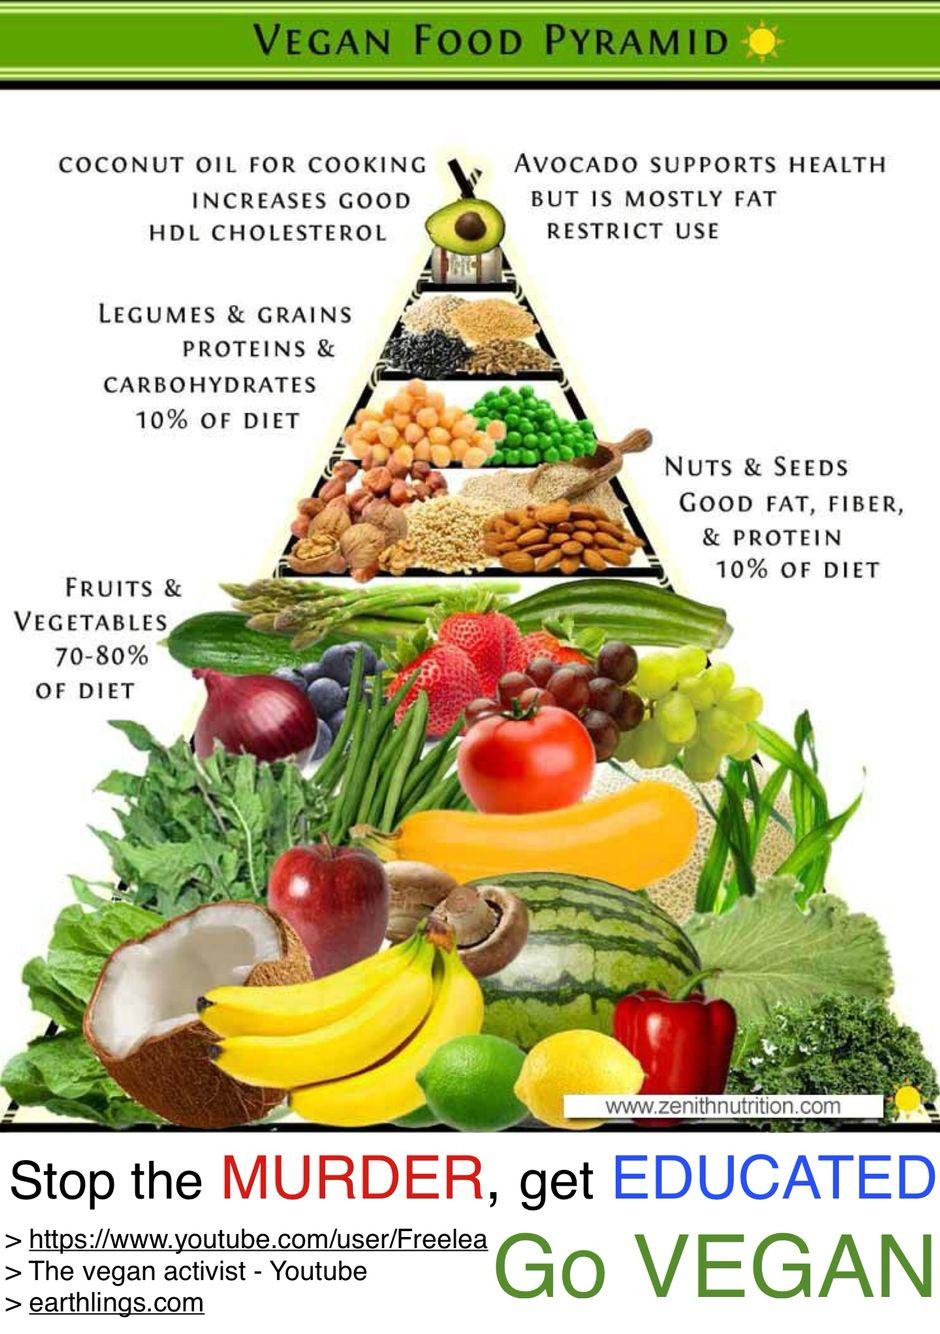 Vegan food pyramid by Heather Tuss on Easy Vegan